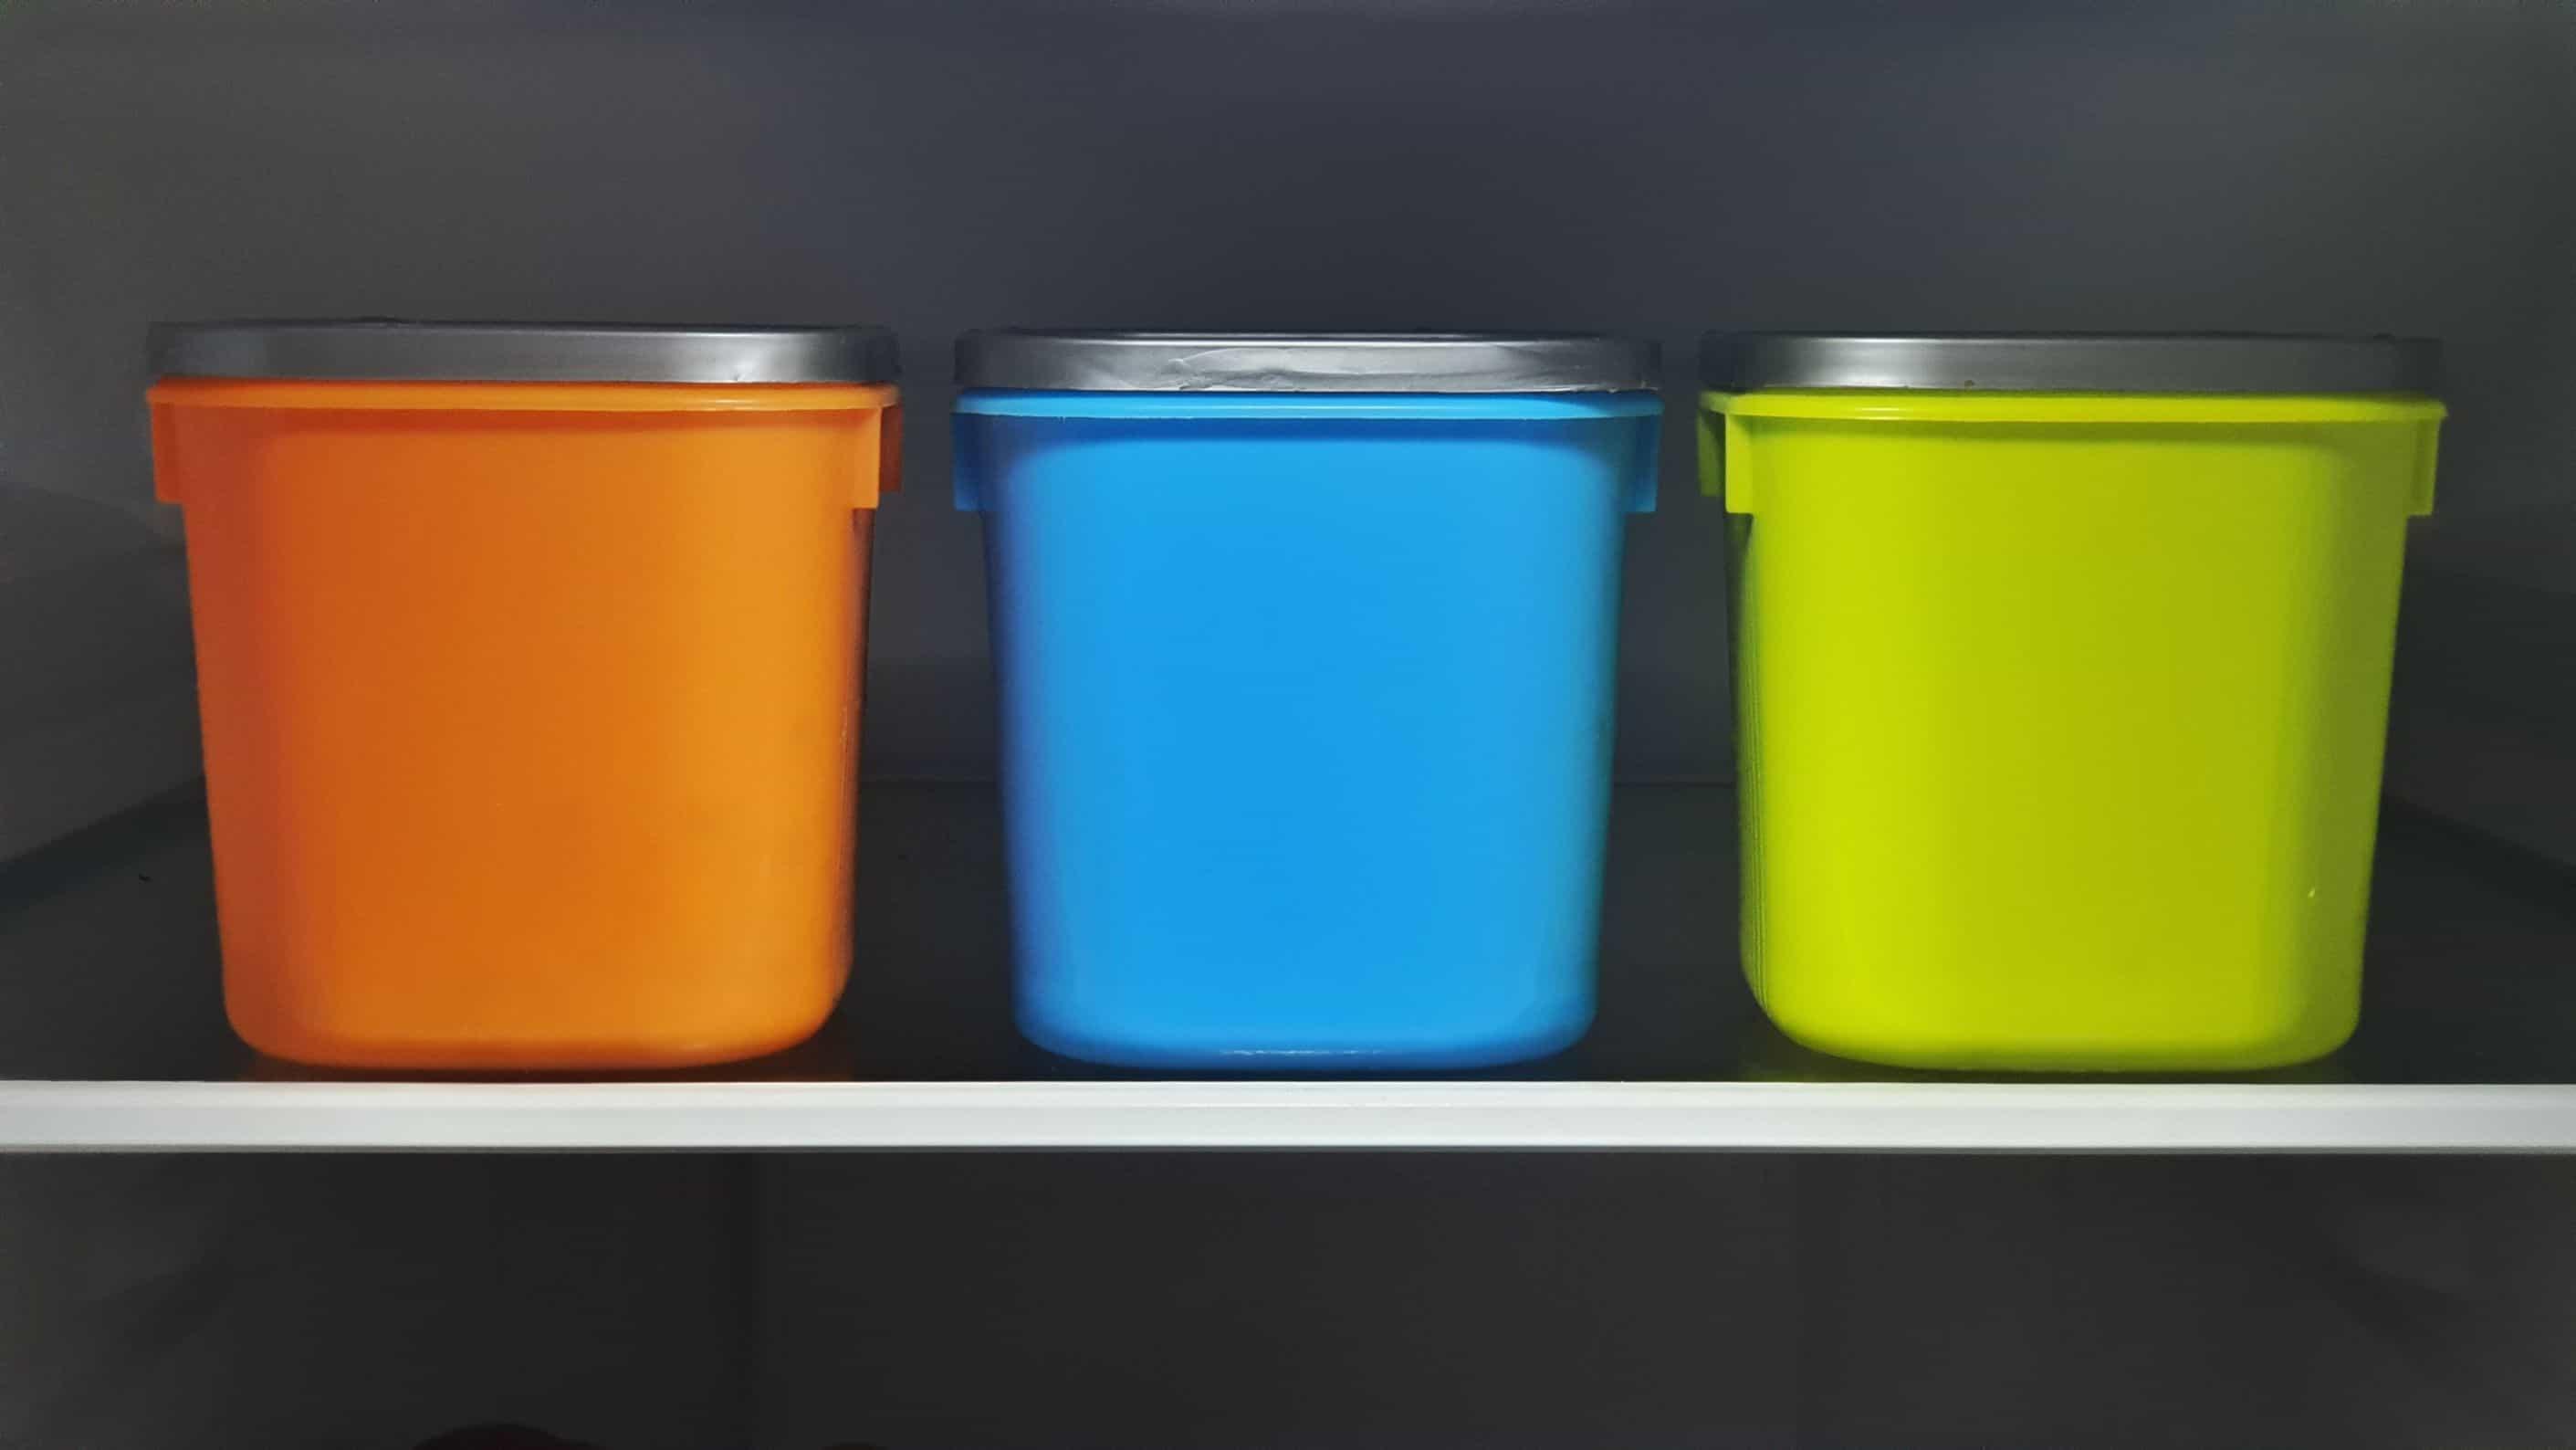 12-shed-storage-ideas-5-plastic-tub-unsplash